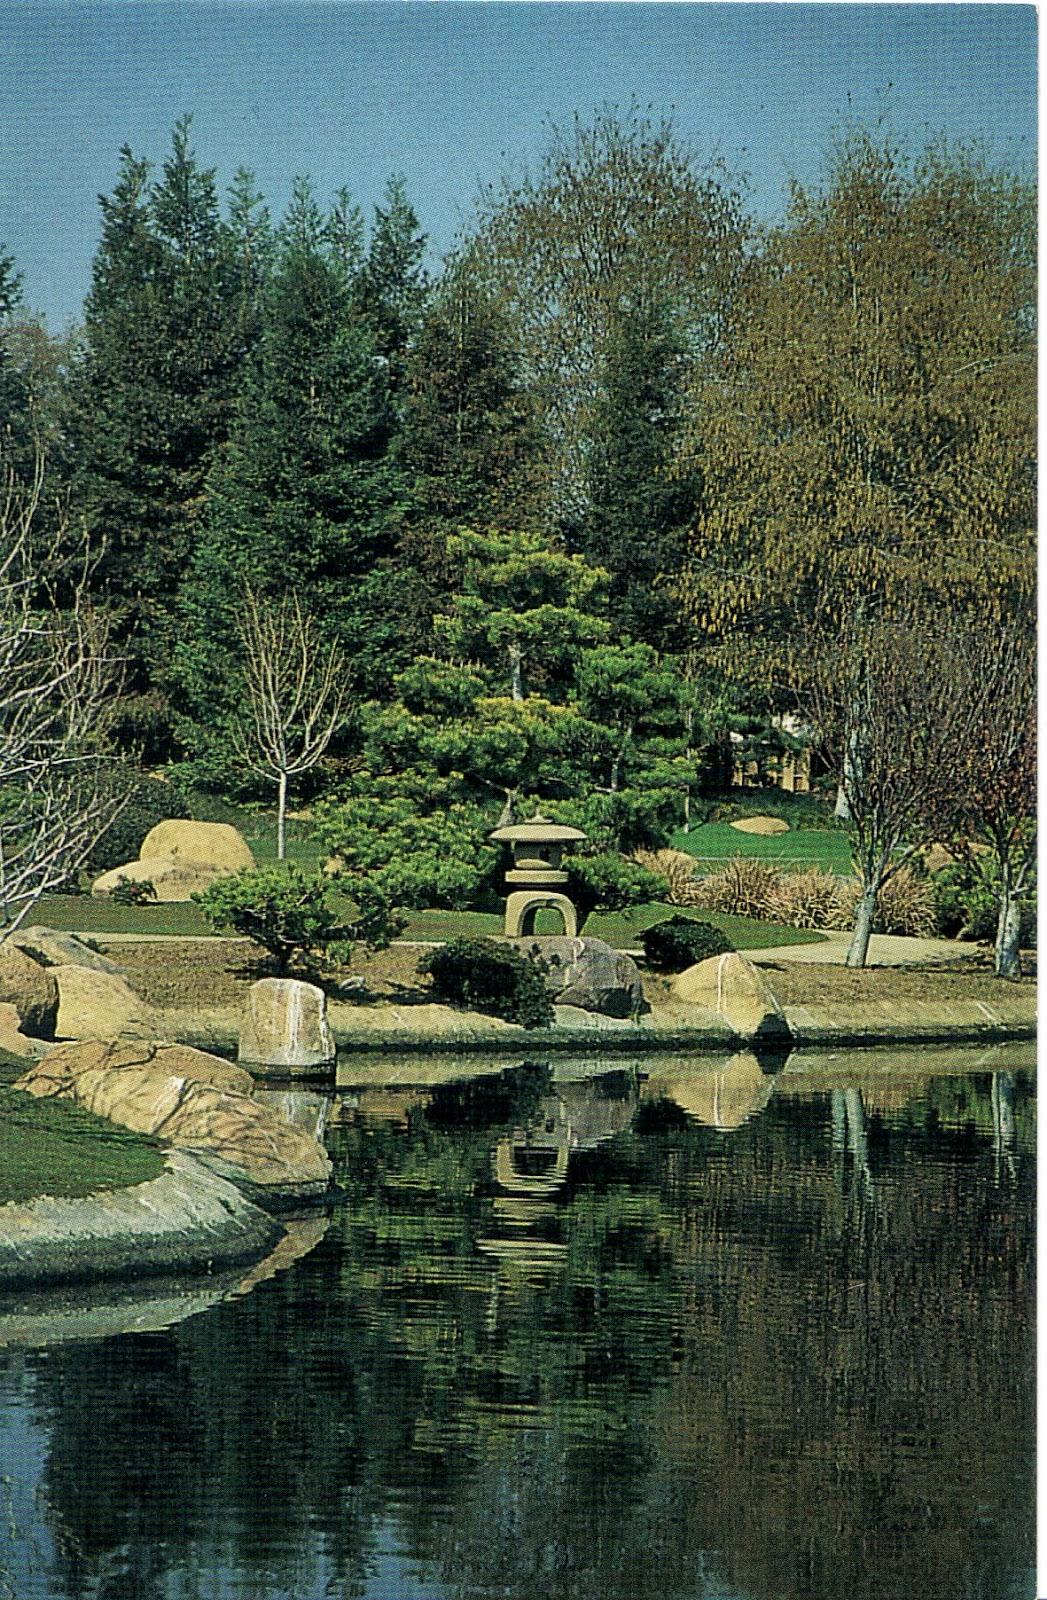 Japanese Garden At The Donald C Tillman Water Reclamation